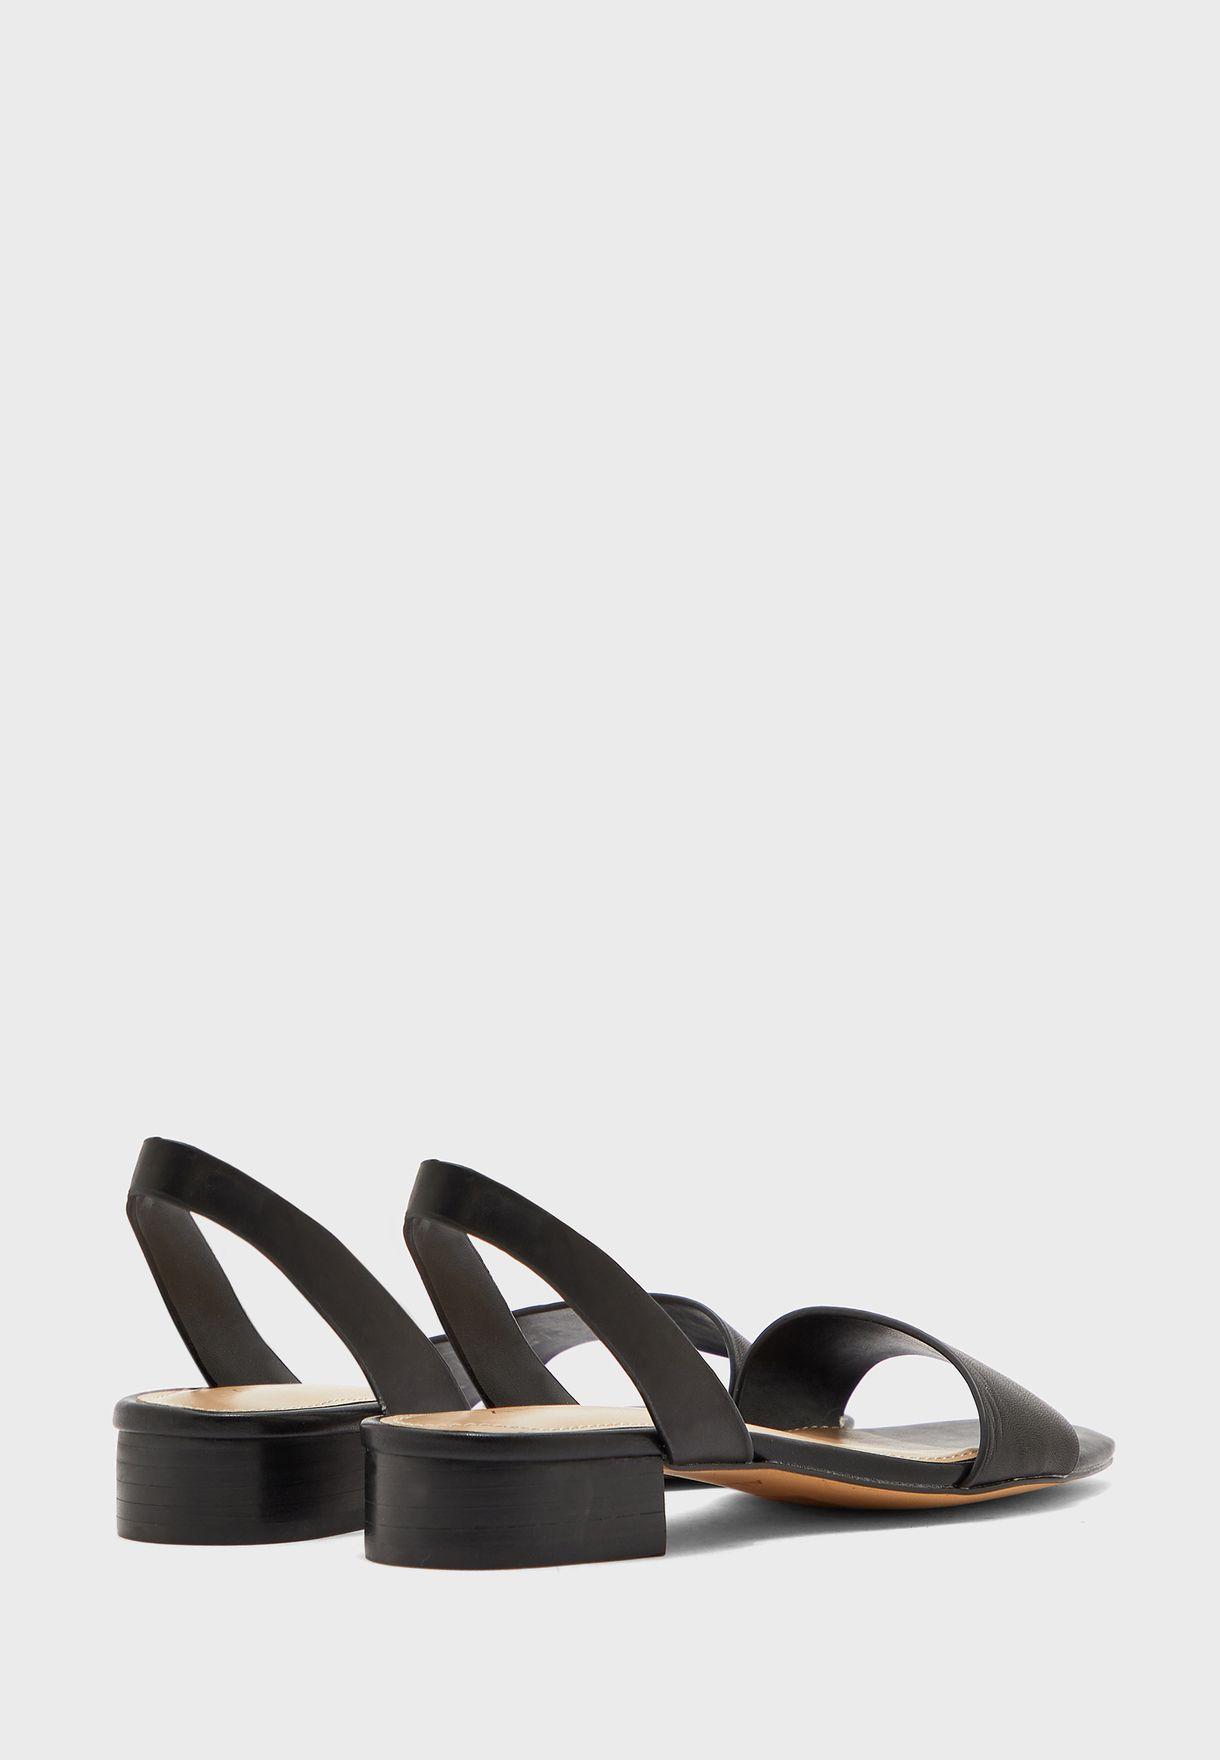 Doredda Low Heel Sandal